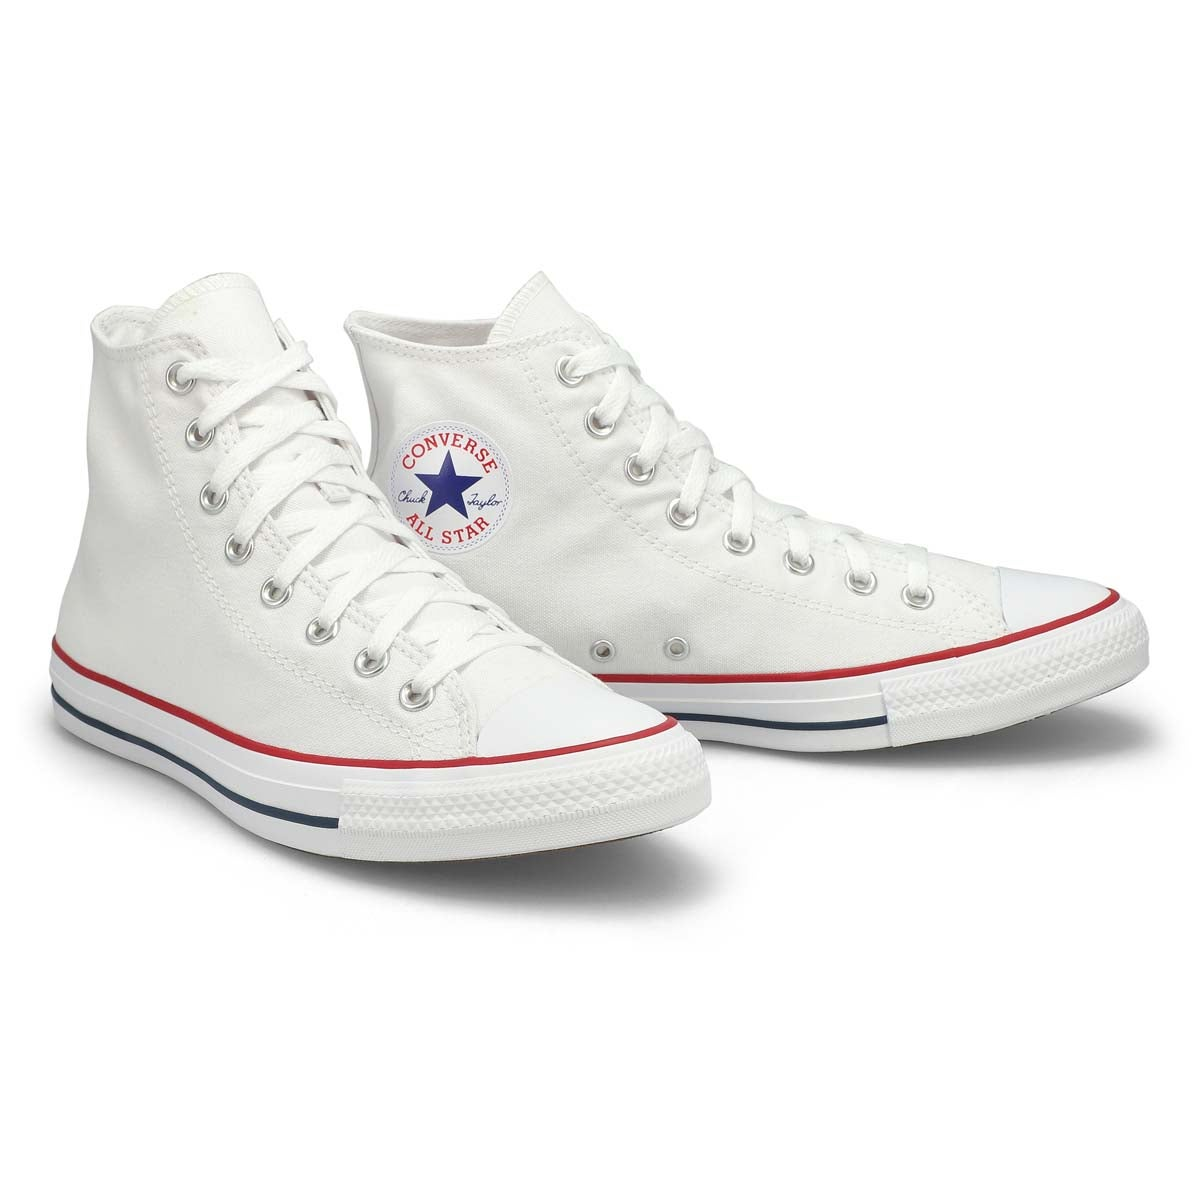 Men's All Star Core Hi Top Sneaker - White